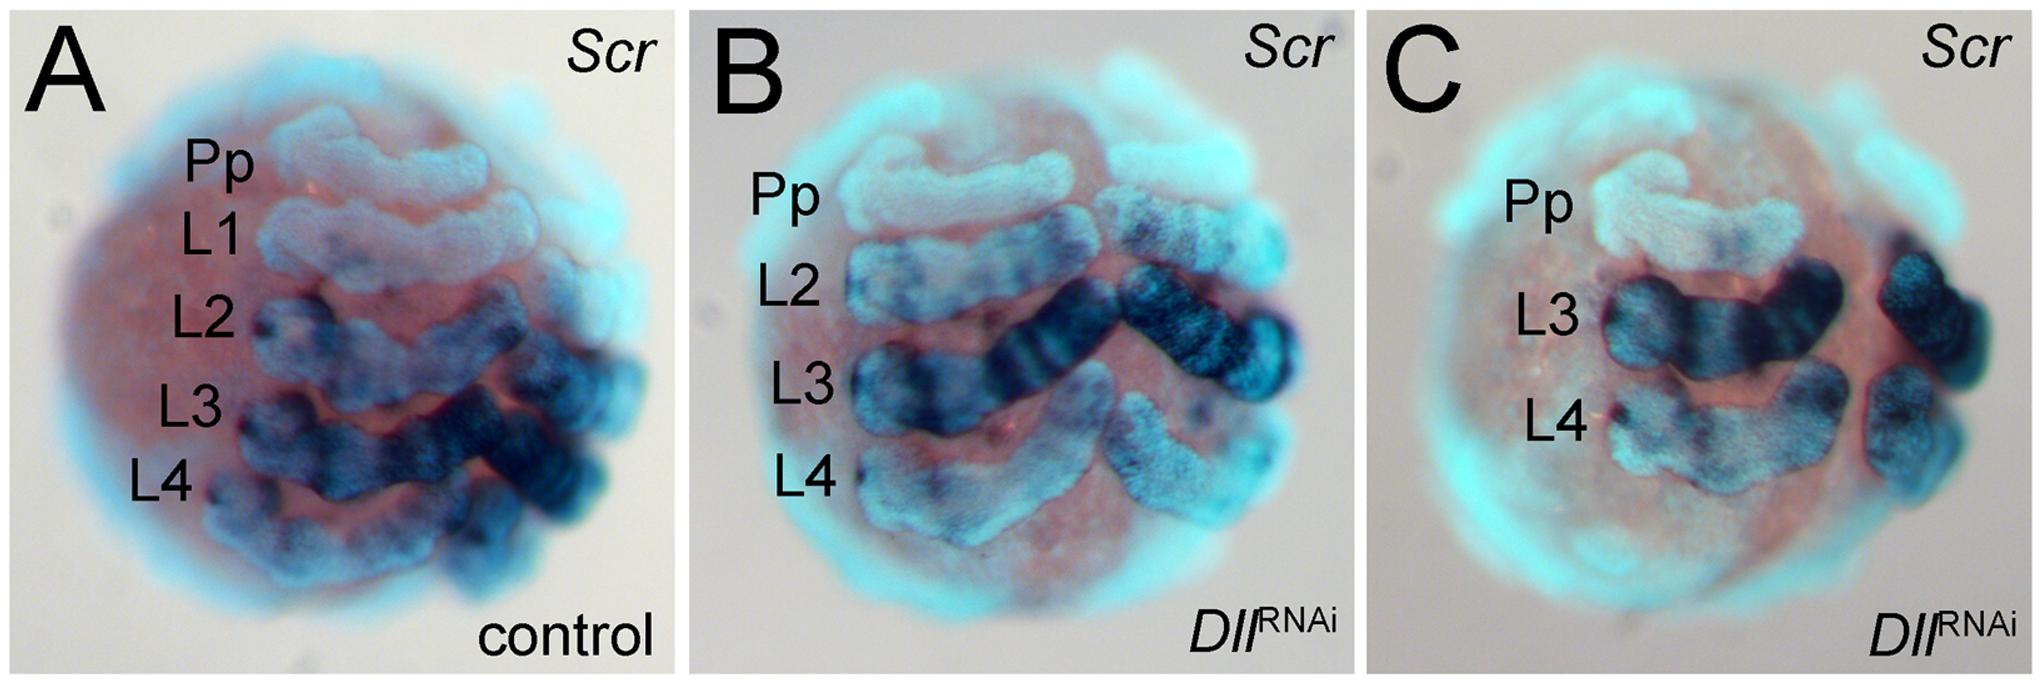 Expression of <i>Scr</i> in <i>At-Dll</i> RNAi embryos.